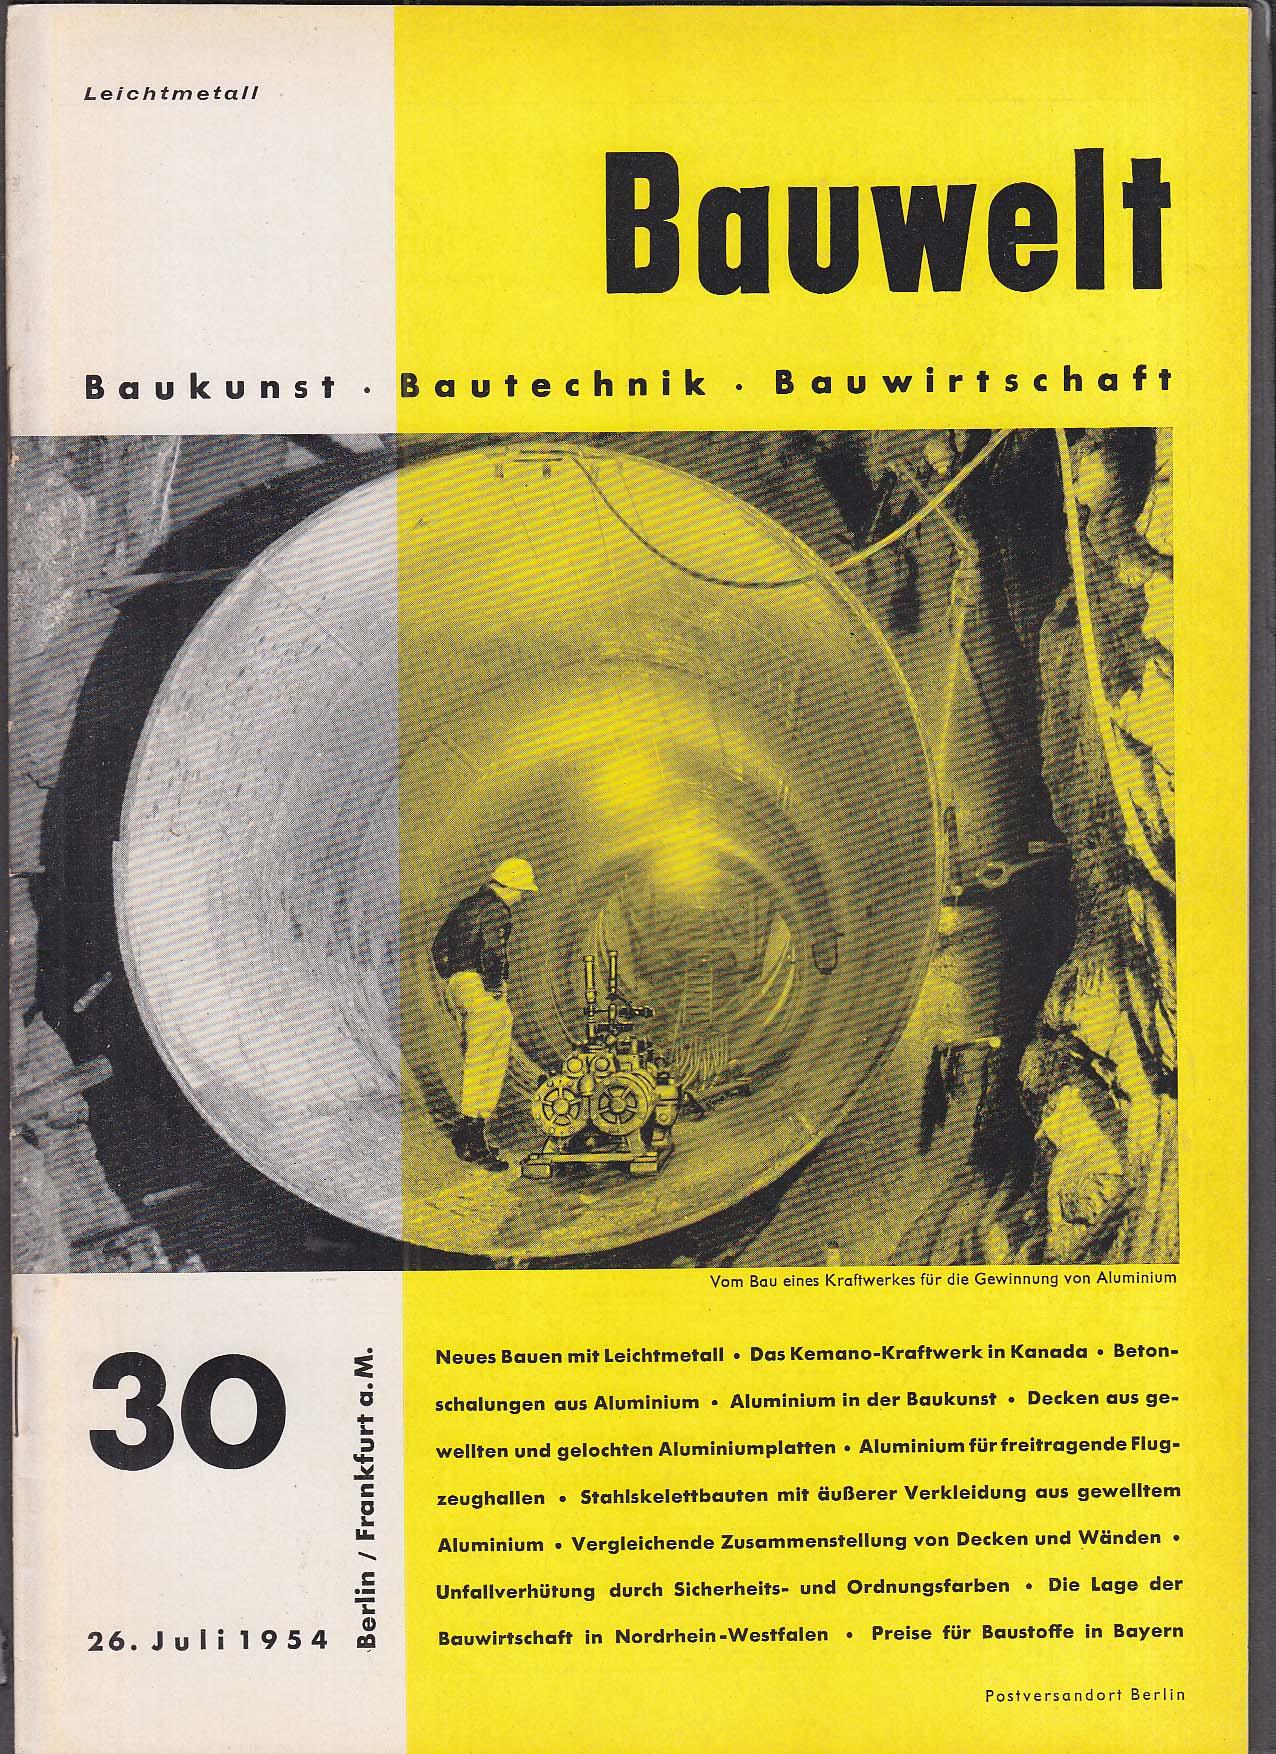 Bauwelt German architecture magazine 7/26/1954 30